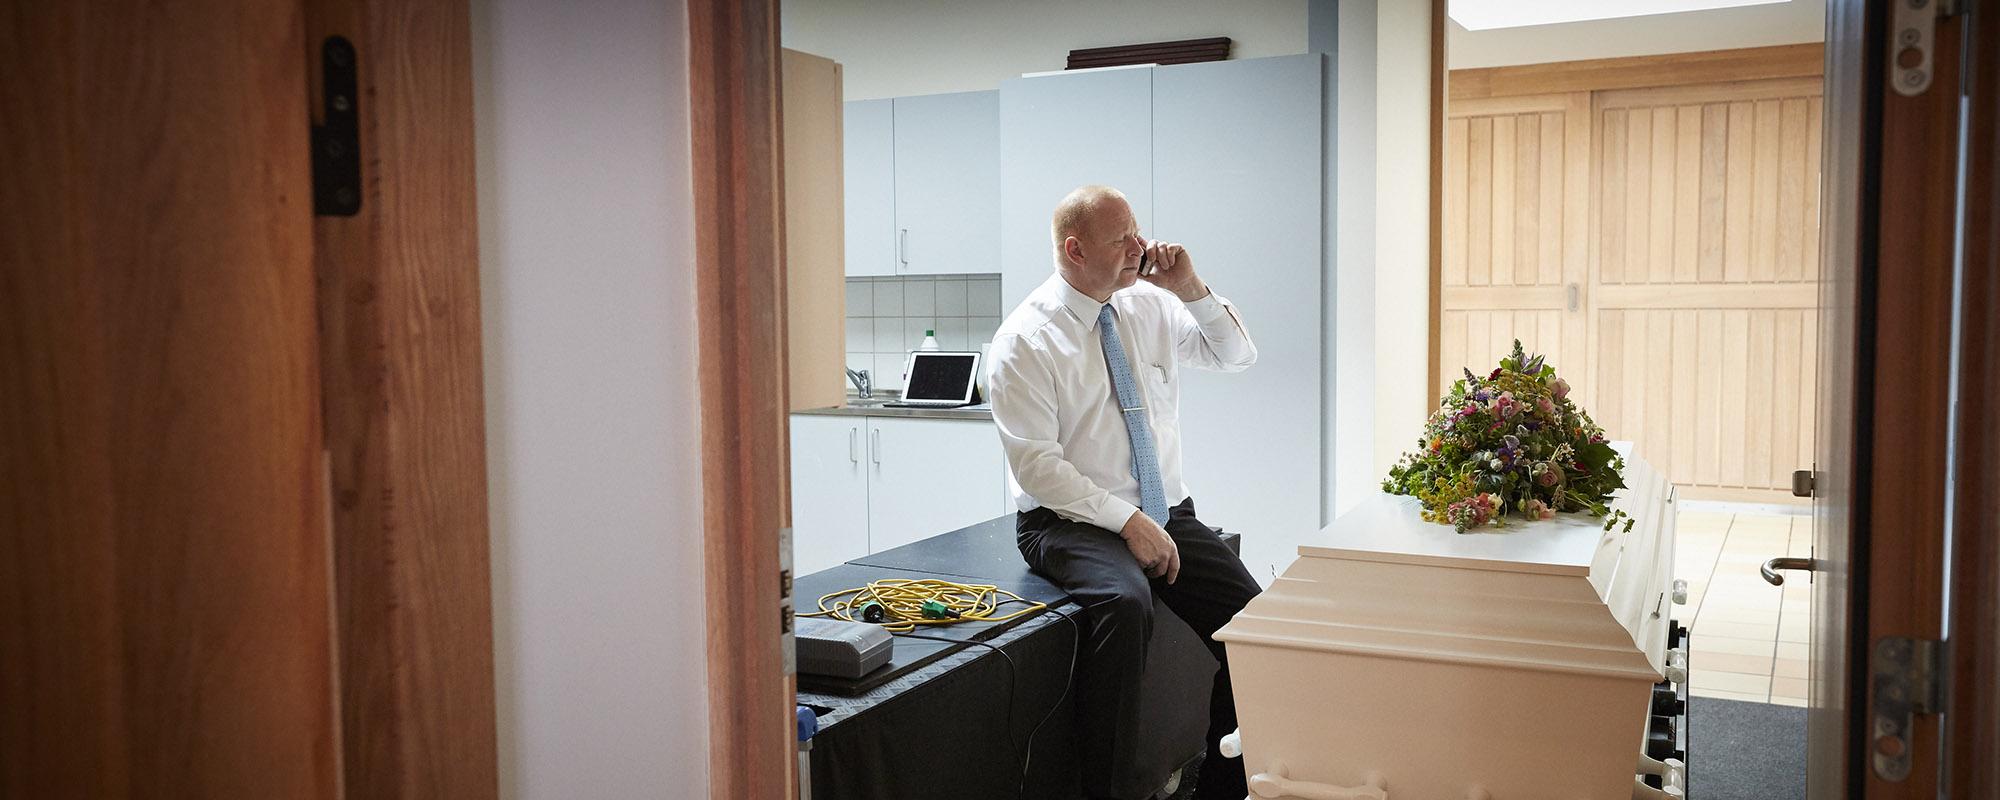 Bedemand Niels Pedersen snakker telefon